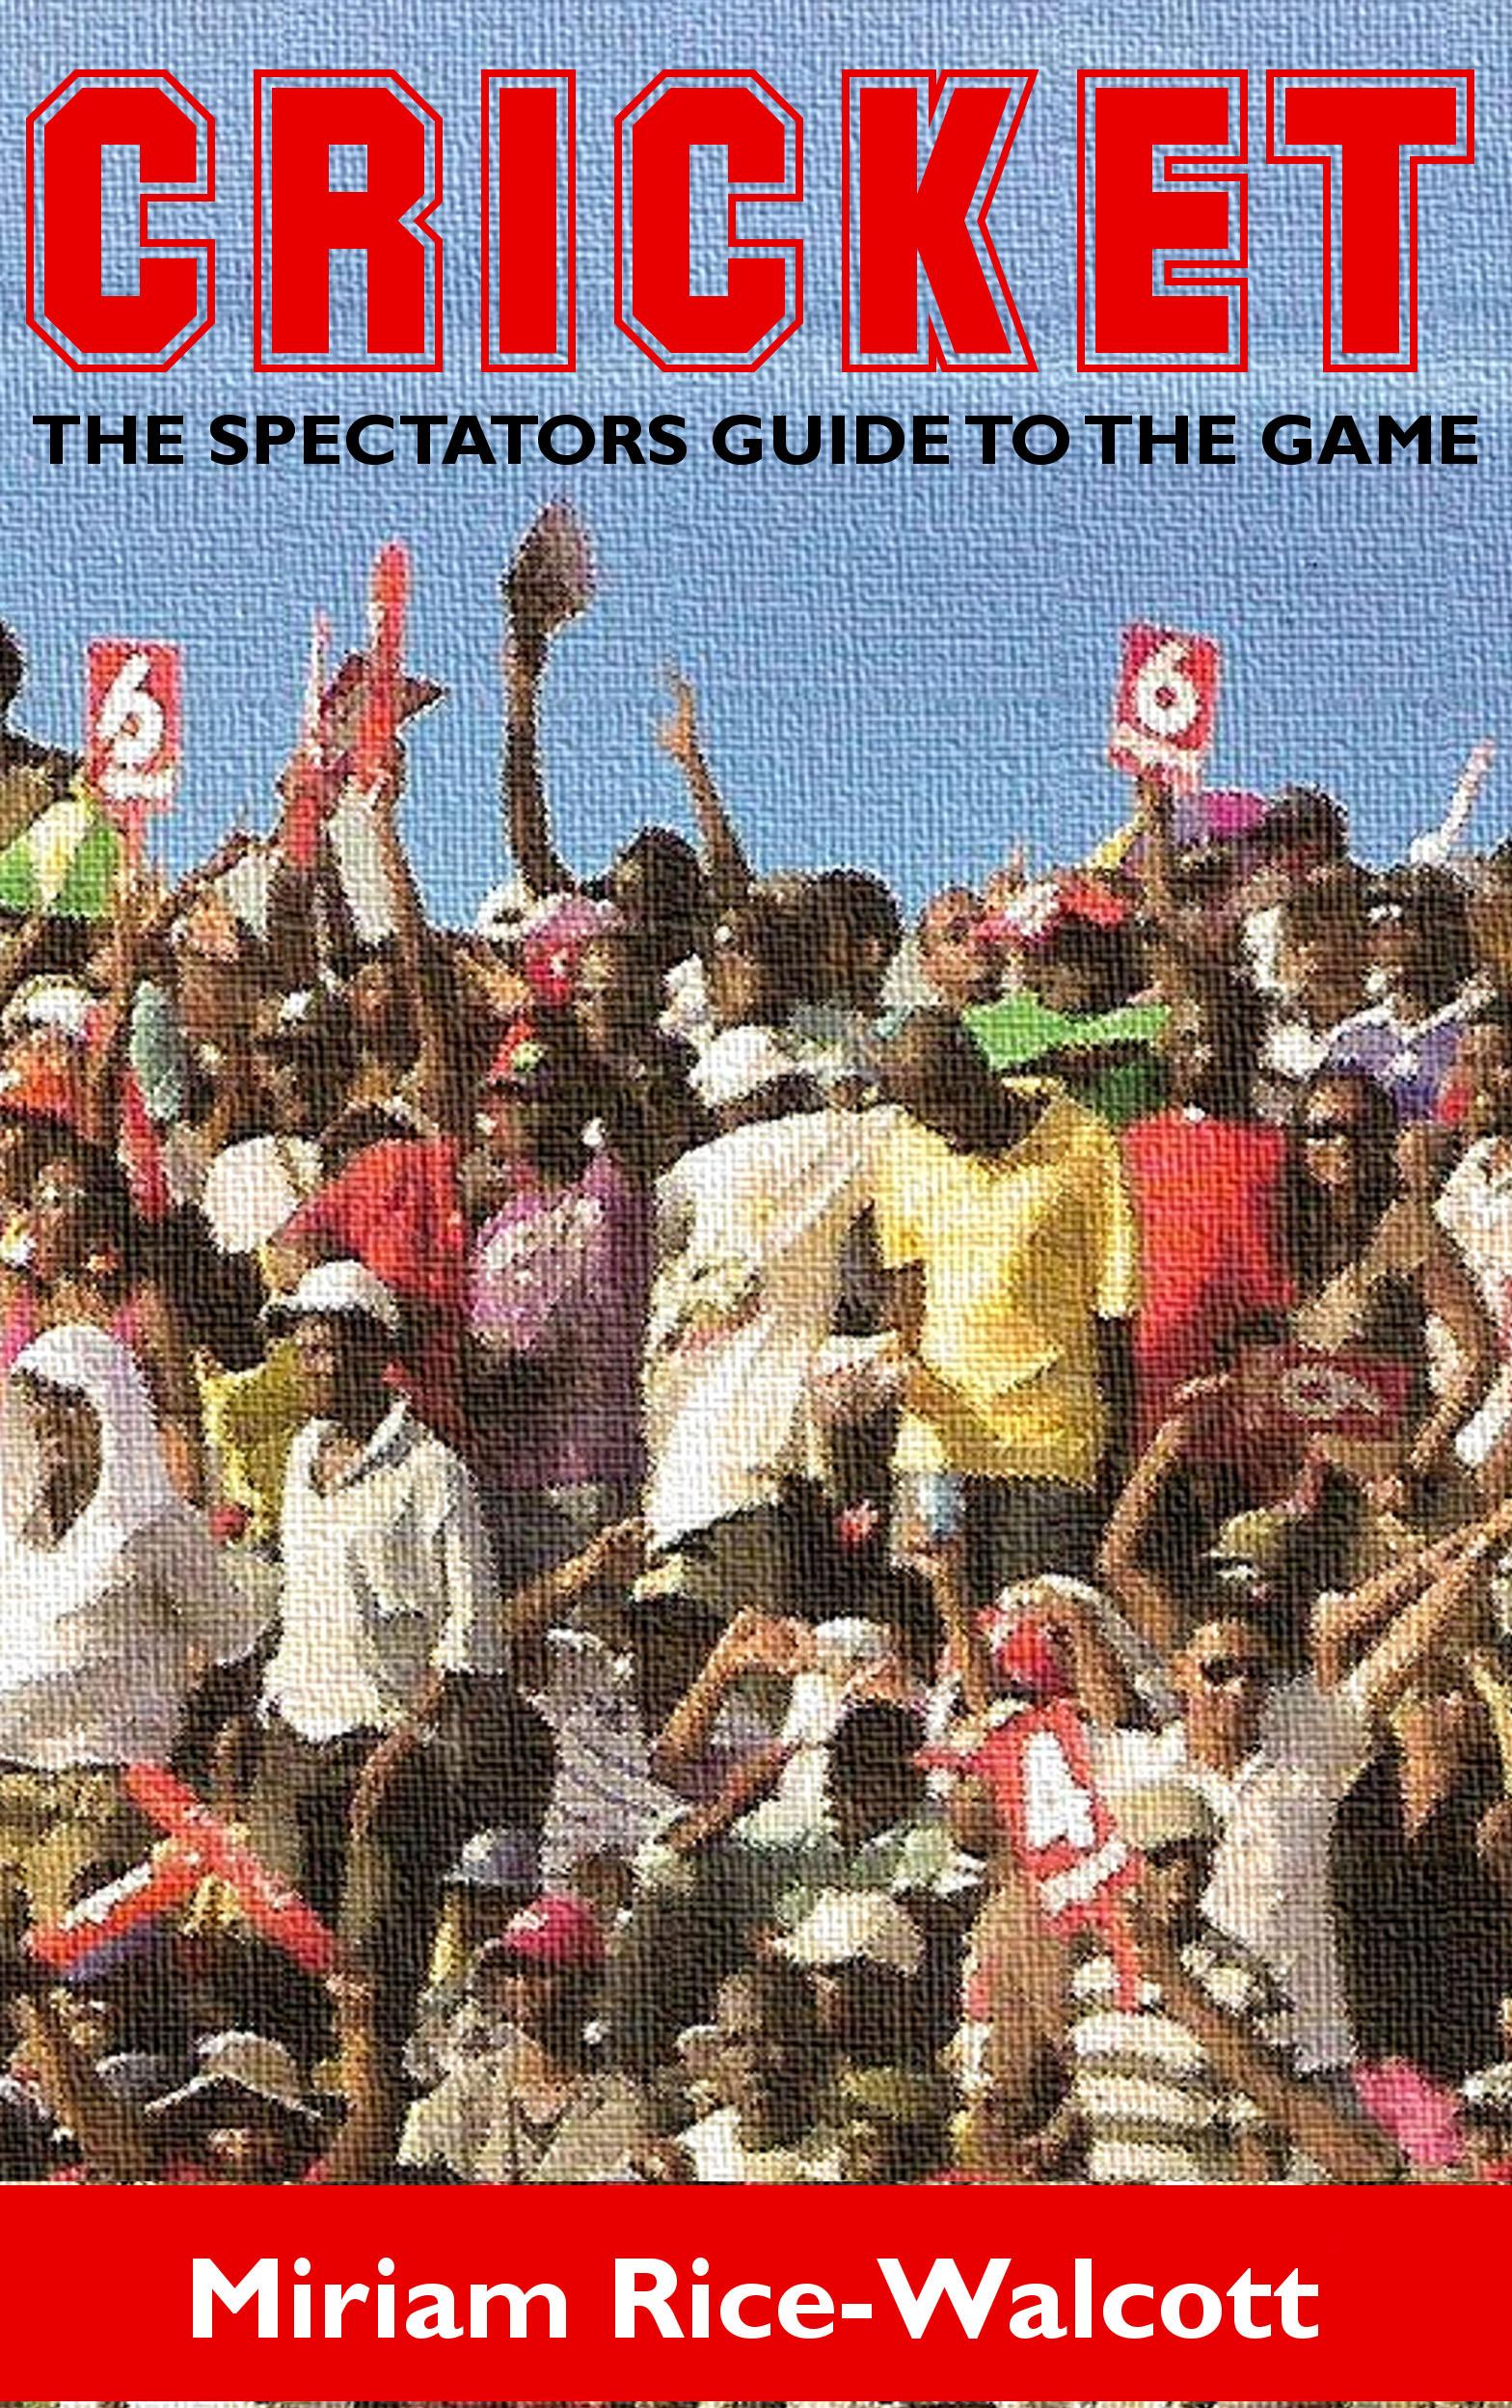 spectators in sport essay